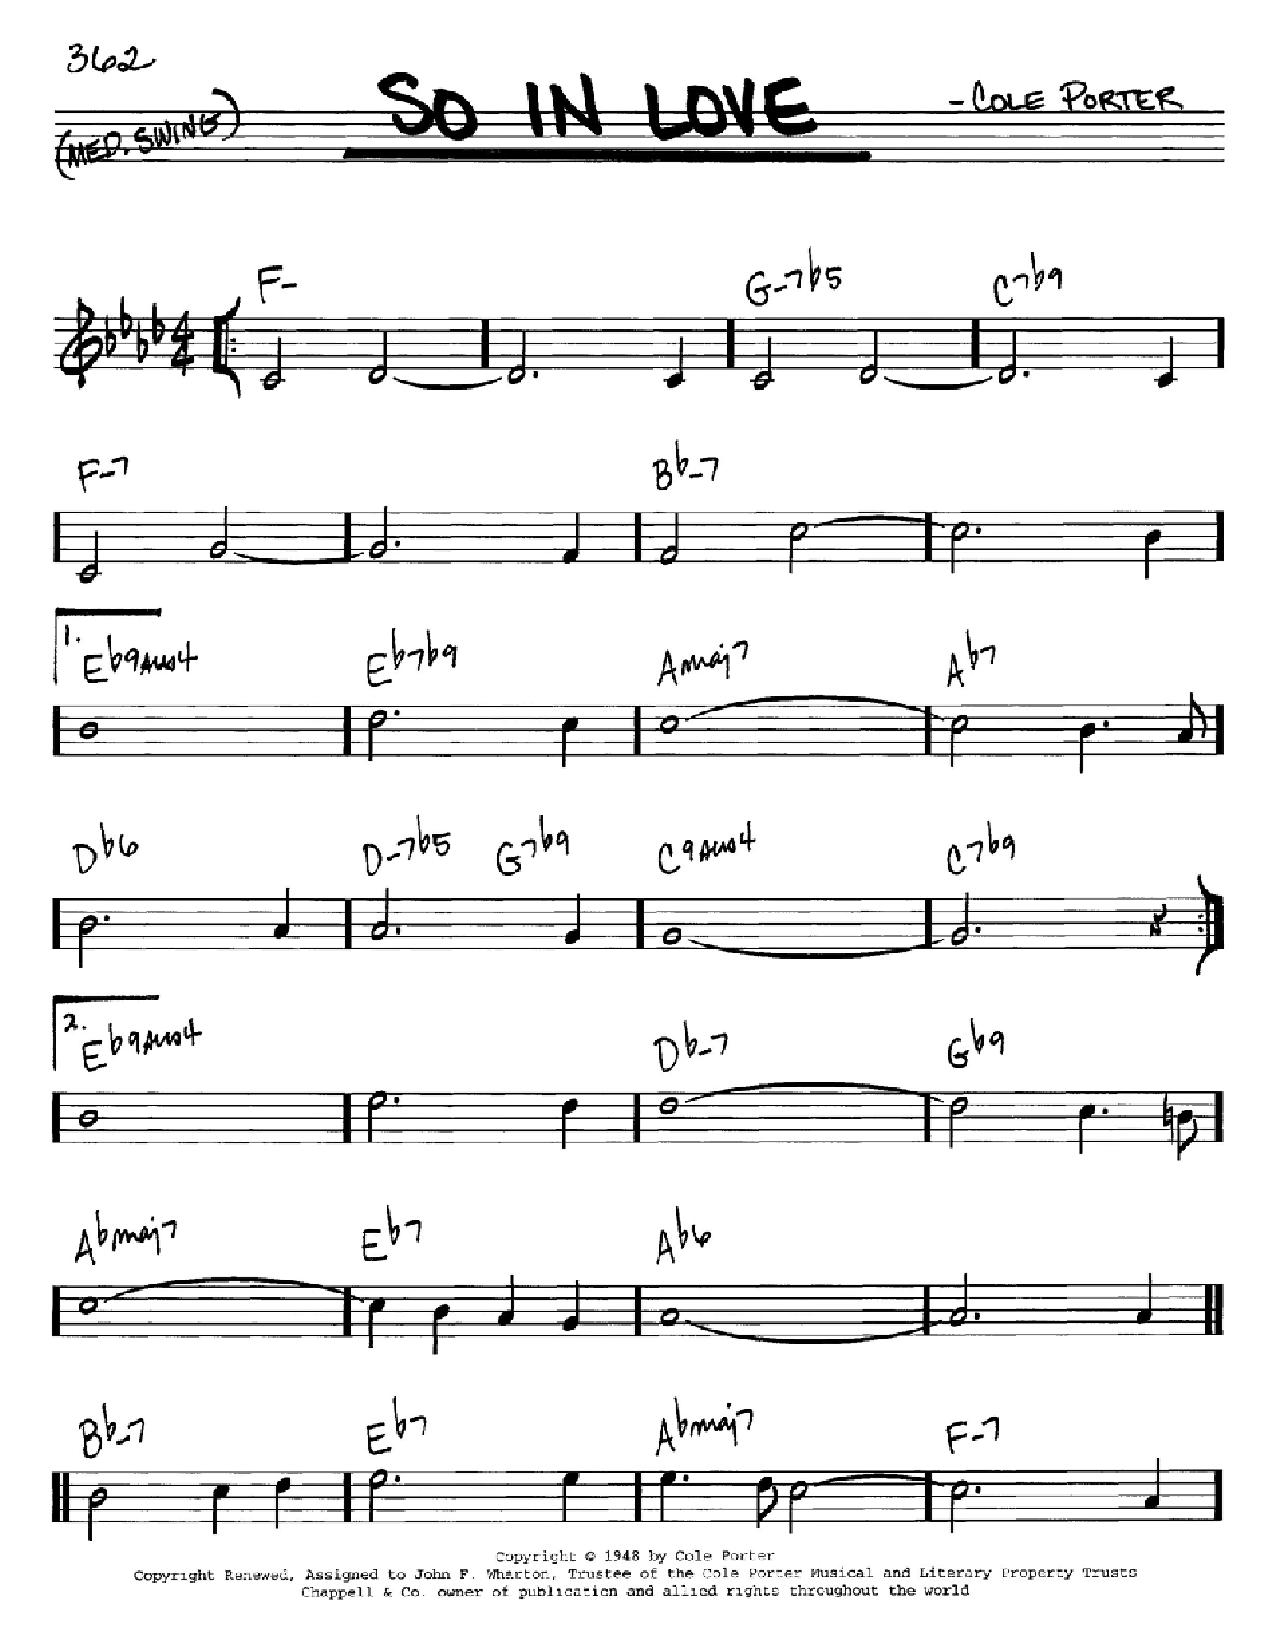 Partition autre So In Love de Rob Schneiderman - Real Book, Melodie et Accords, Inst. En Do